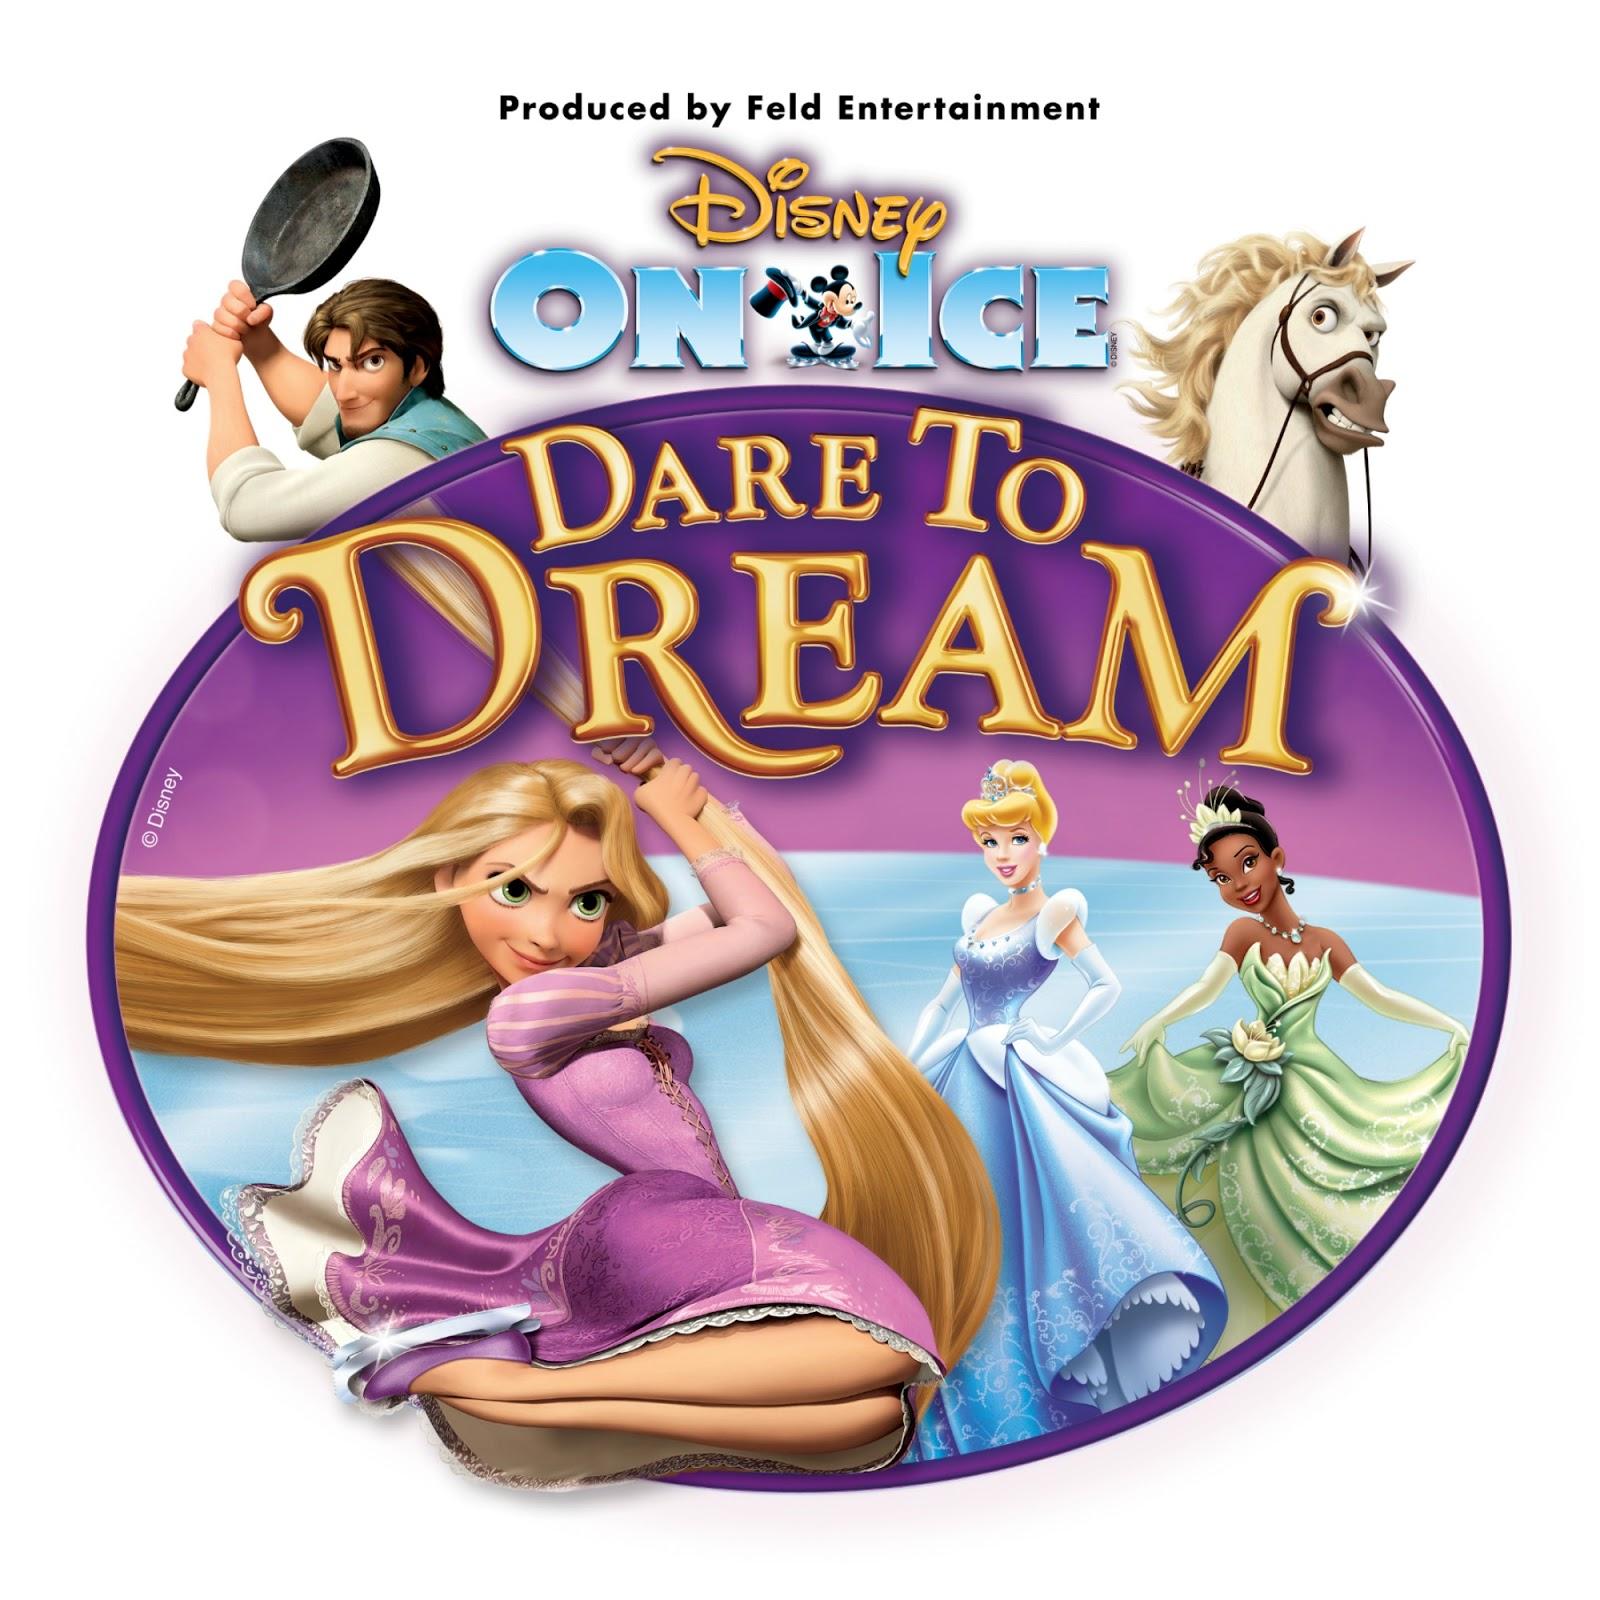 http://www.sixlittlehearts.com/2015/04/disney-on-ice-presents-dare-to-dream.html